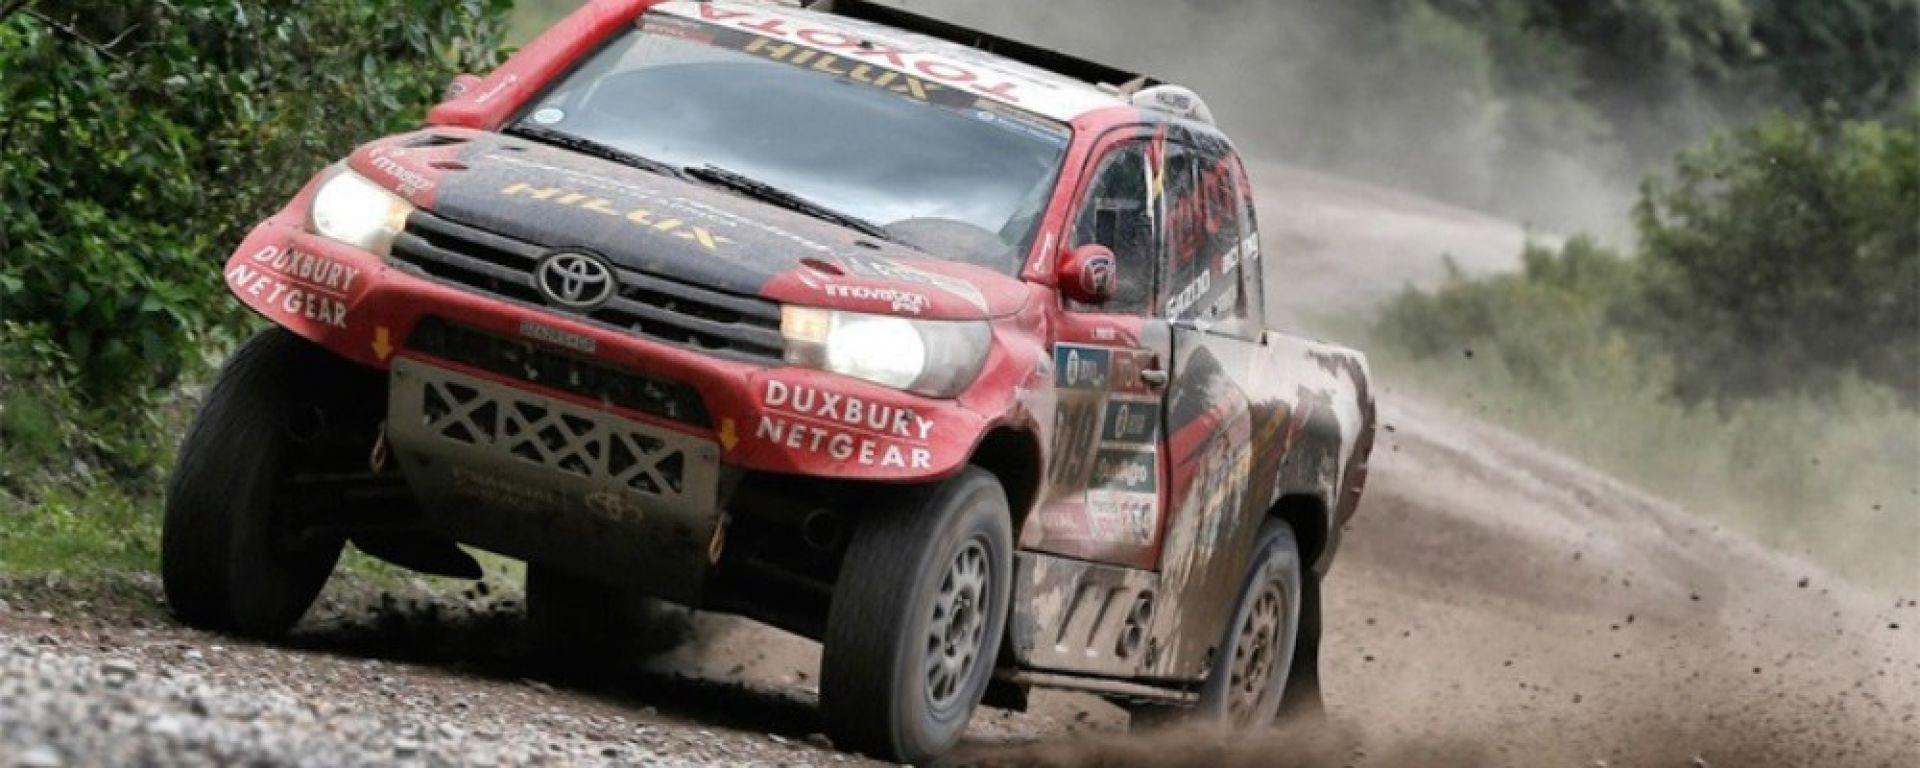 Dakar 2016 - Toyota Hilux Evo